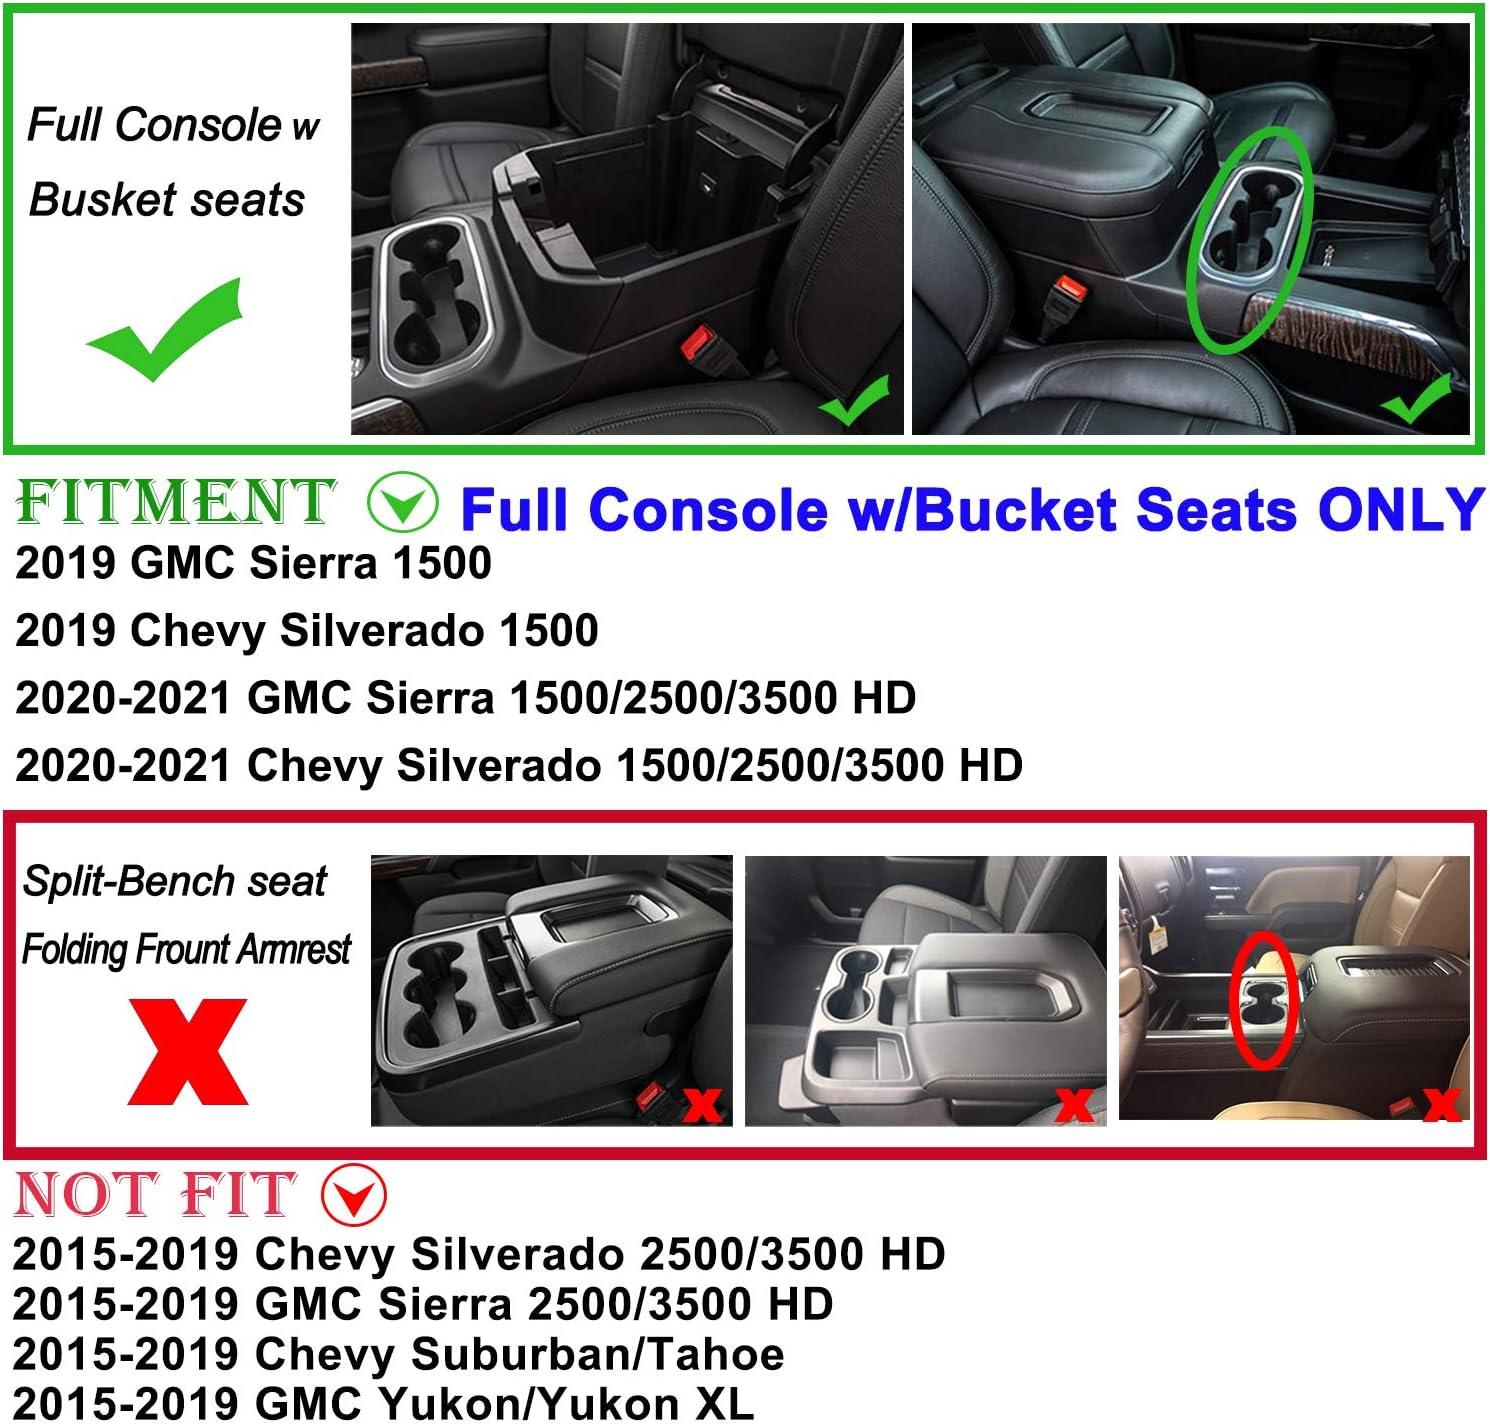 Full Console w//Bucket Seats ONLY Richeer Center Console Organizer Tray Compatible with 2019-2020 GMC Sierra 1500//Chevy Sliverado 1500 2020 Sliverado 1500//GMC Sierra 2500HD//3500 HD Armrest Box